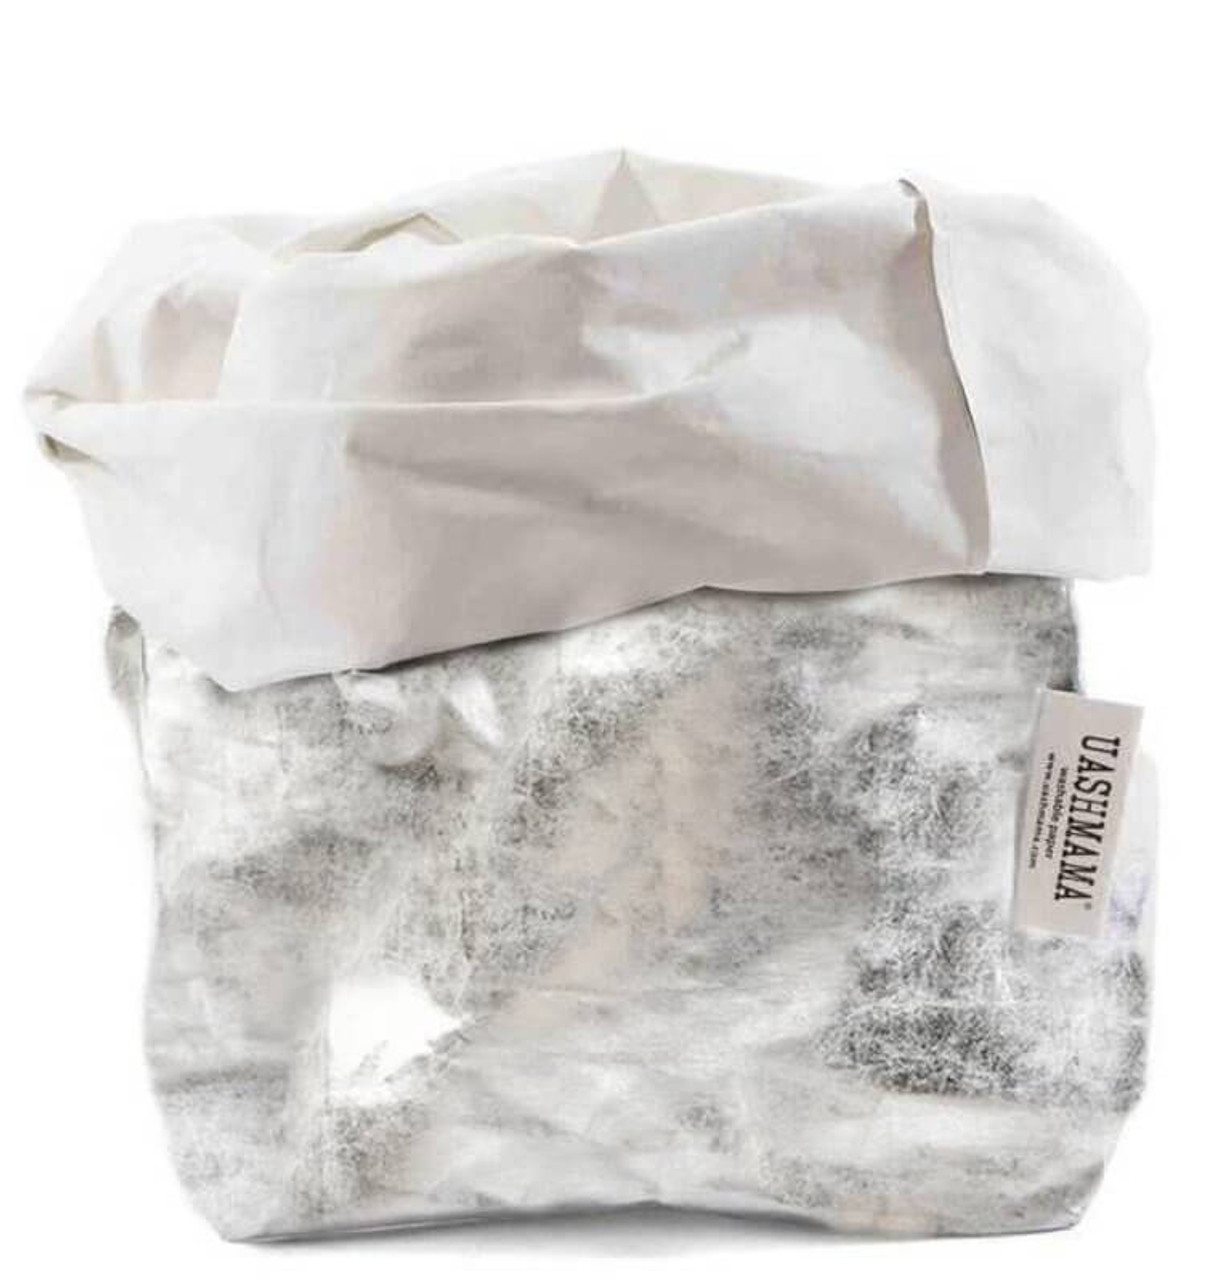 UASHMAMA small organic paper bags nuvola